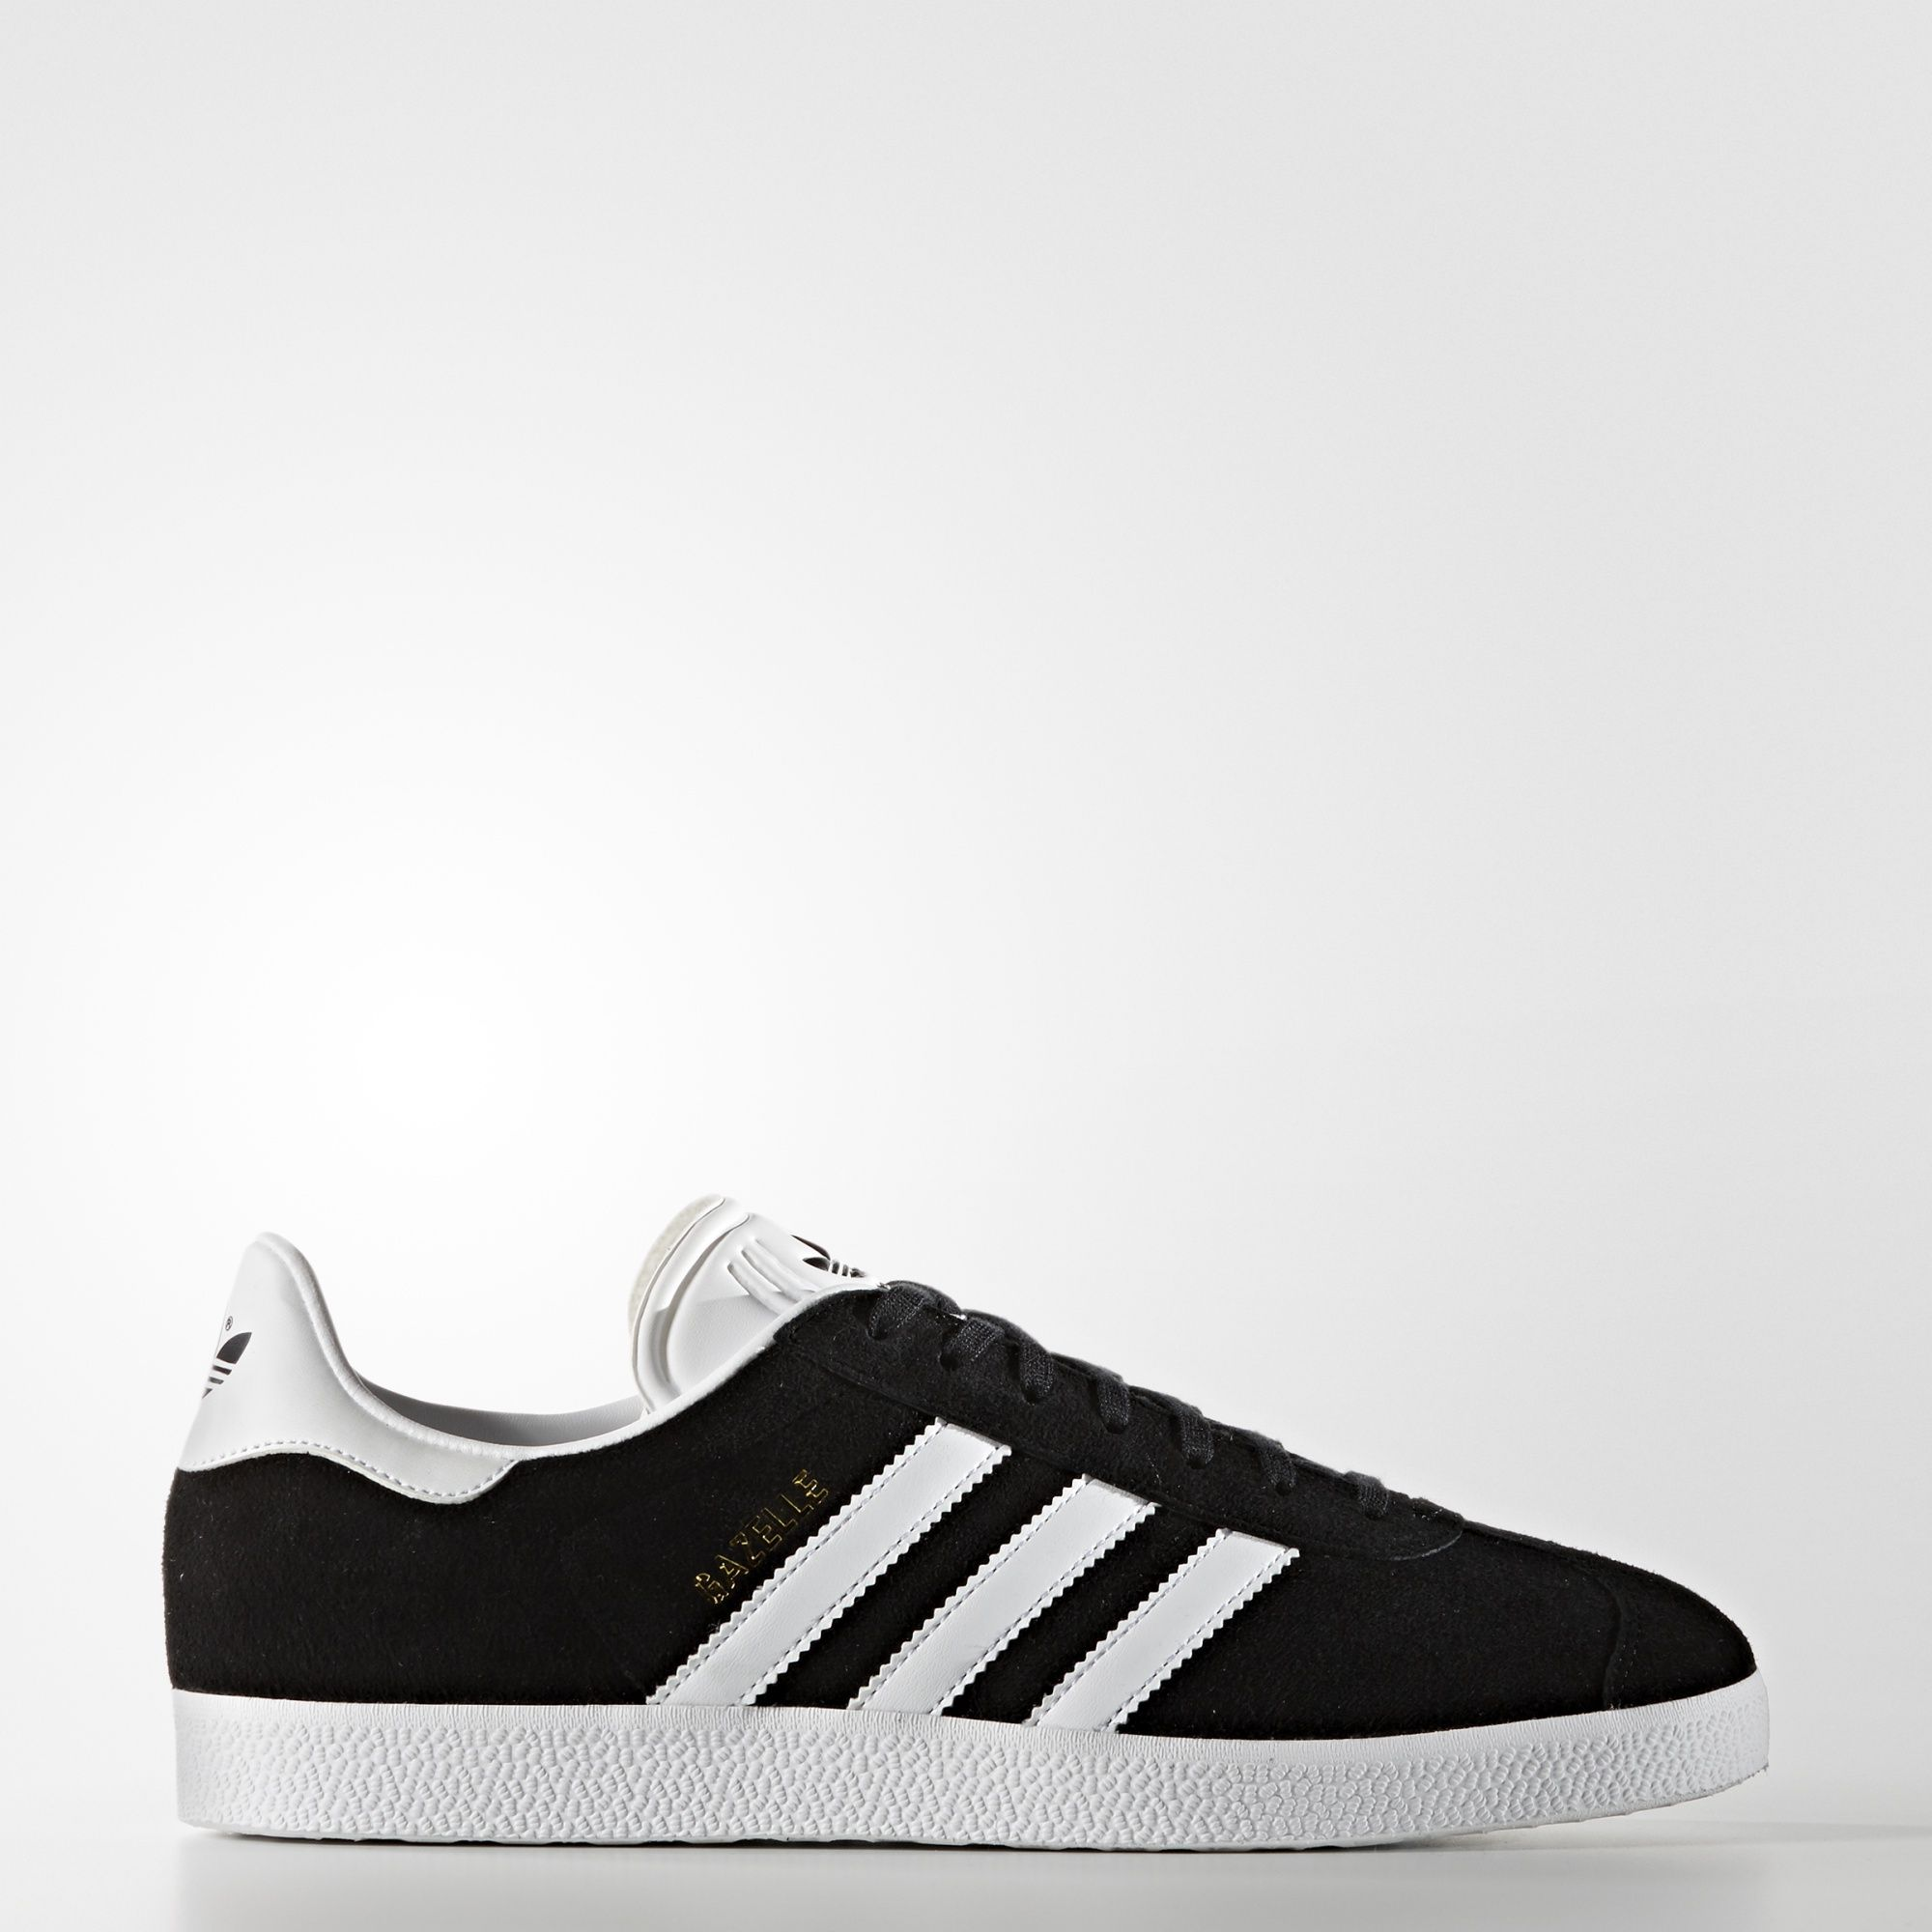 huge discount 253c6 363d2 Gazelle Noire, Chaussures Gazelle, Chaussures Femme, Mode Homme, Adidas  Hommes, Baskets